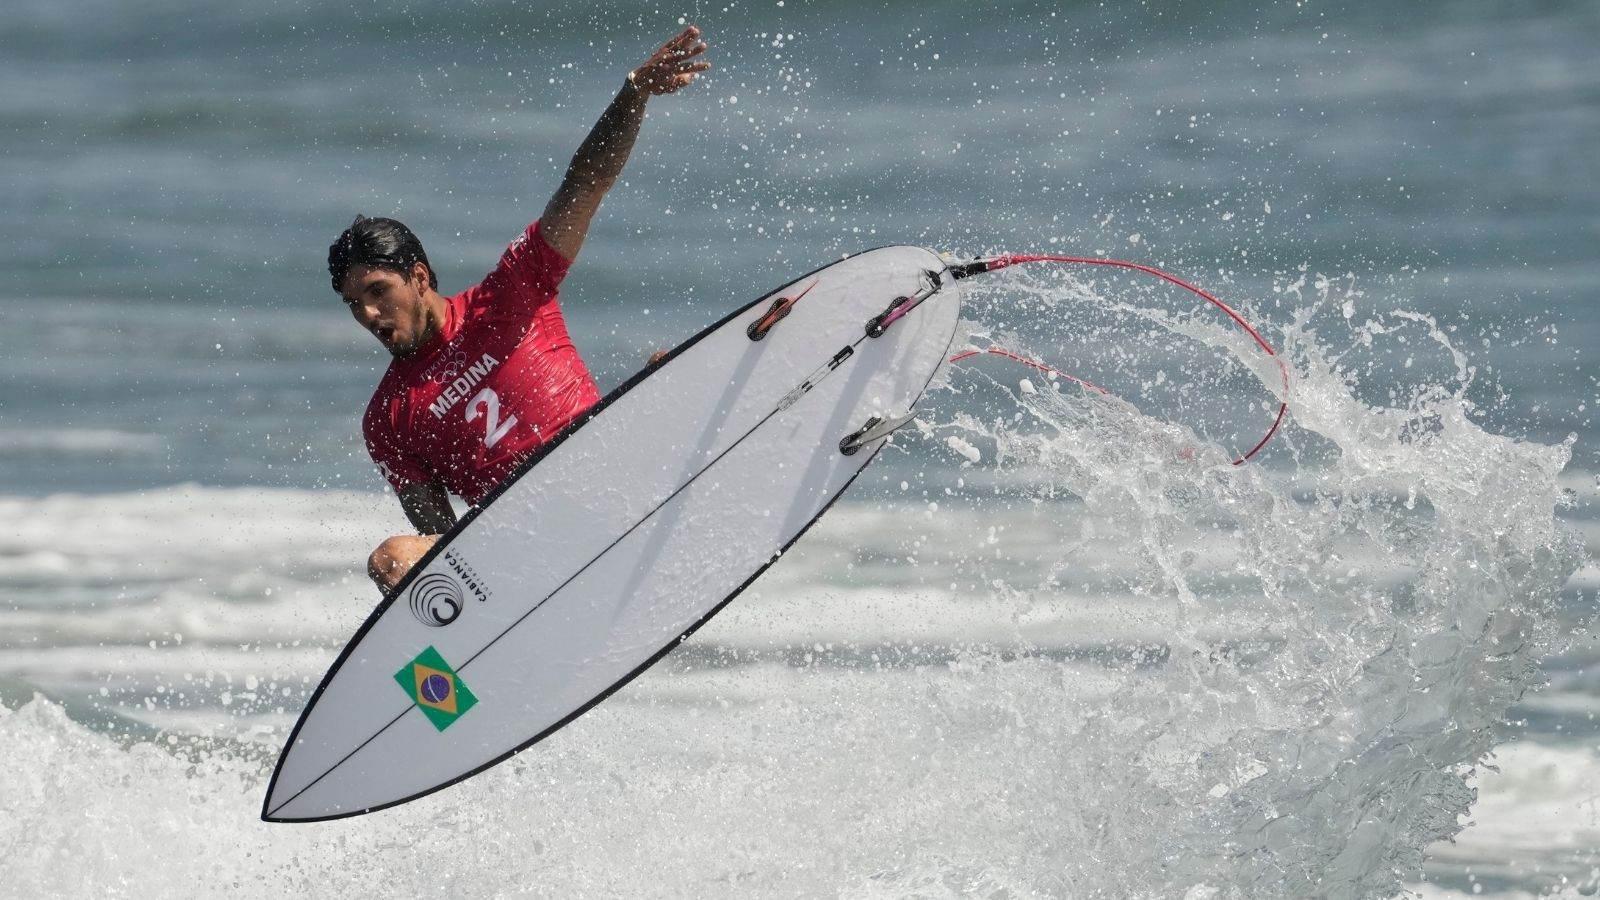 Gabriel Medina surfa onda na praia de Tsurigasaki